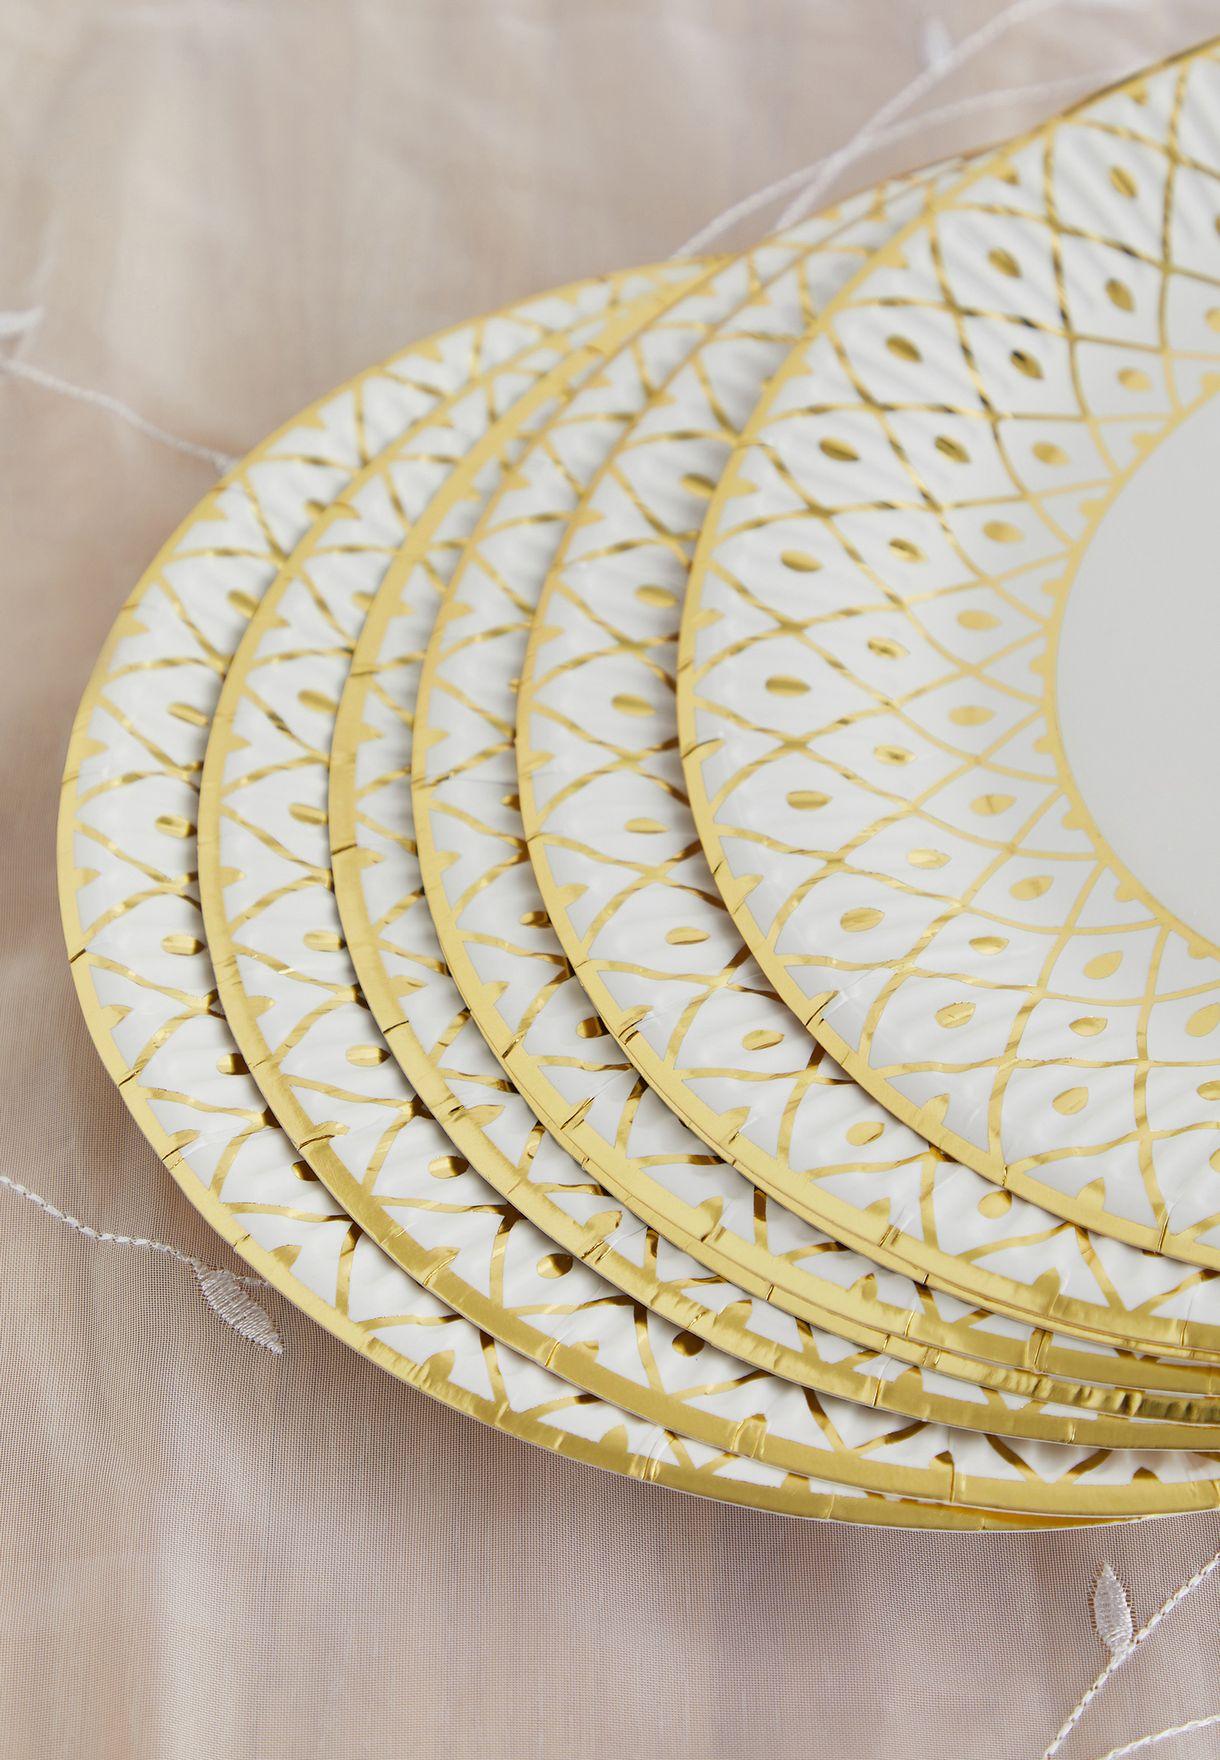 Party Porcelain Gold Deco Plate Medium 8 Pack